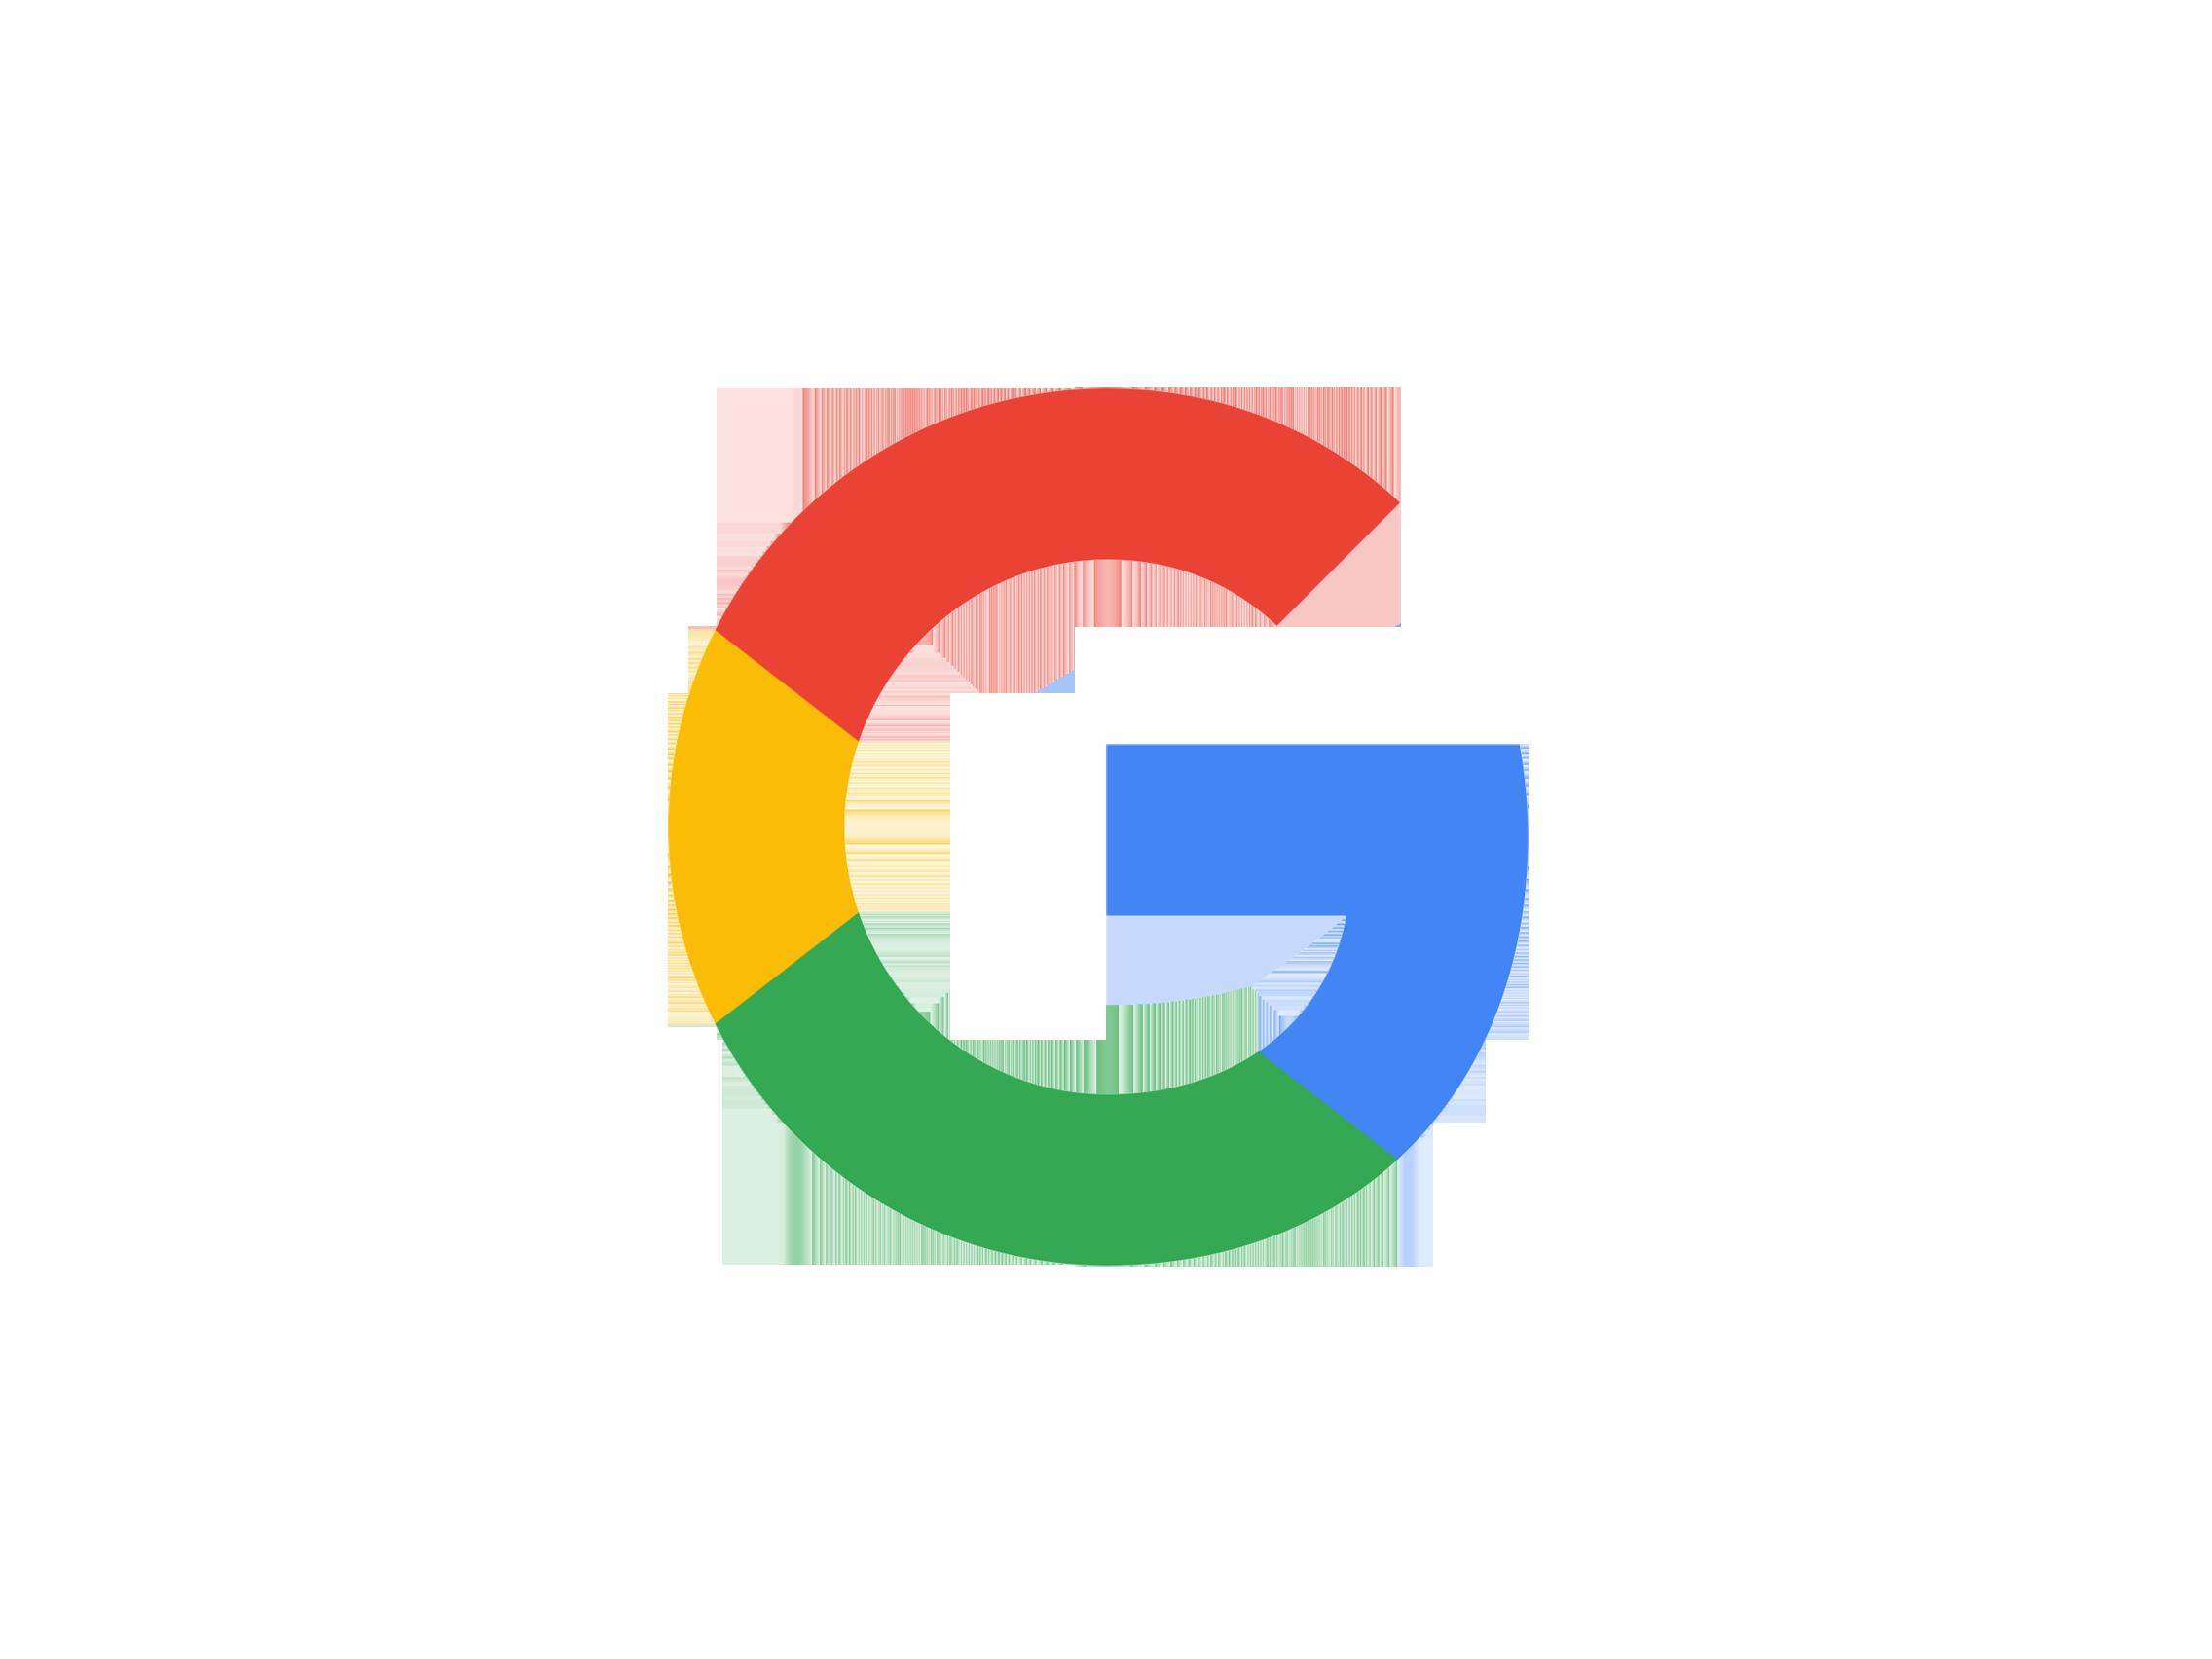 Google logo png. Orthodontic dictionary orthodontist rockford